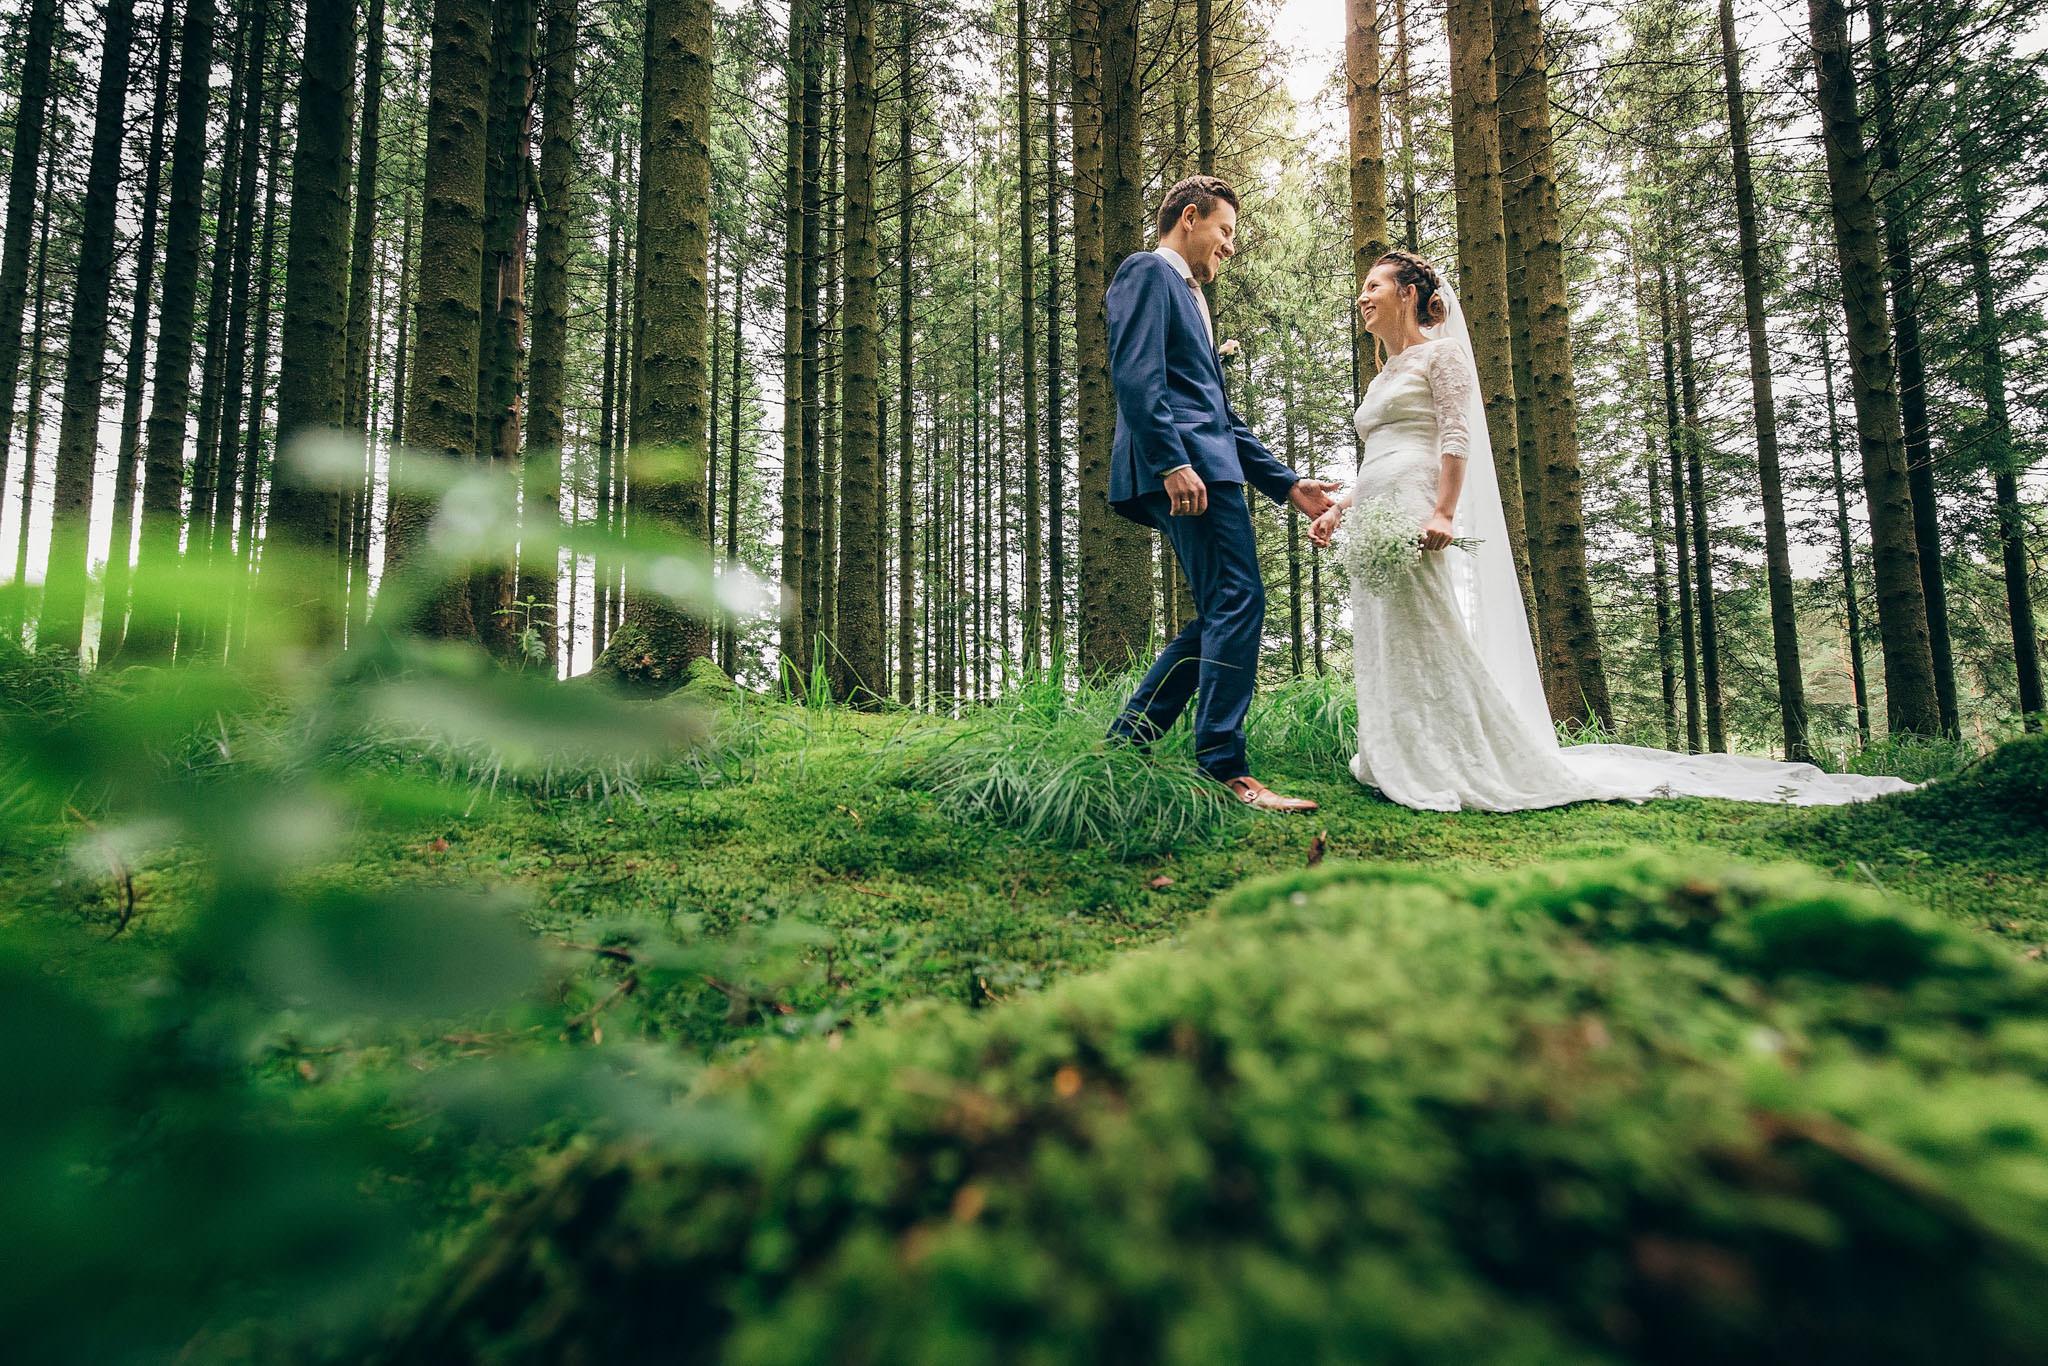 Norway+wedding+photographer+elopement+pre+wedding+Casey+Arneson-63.jpg